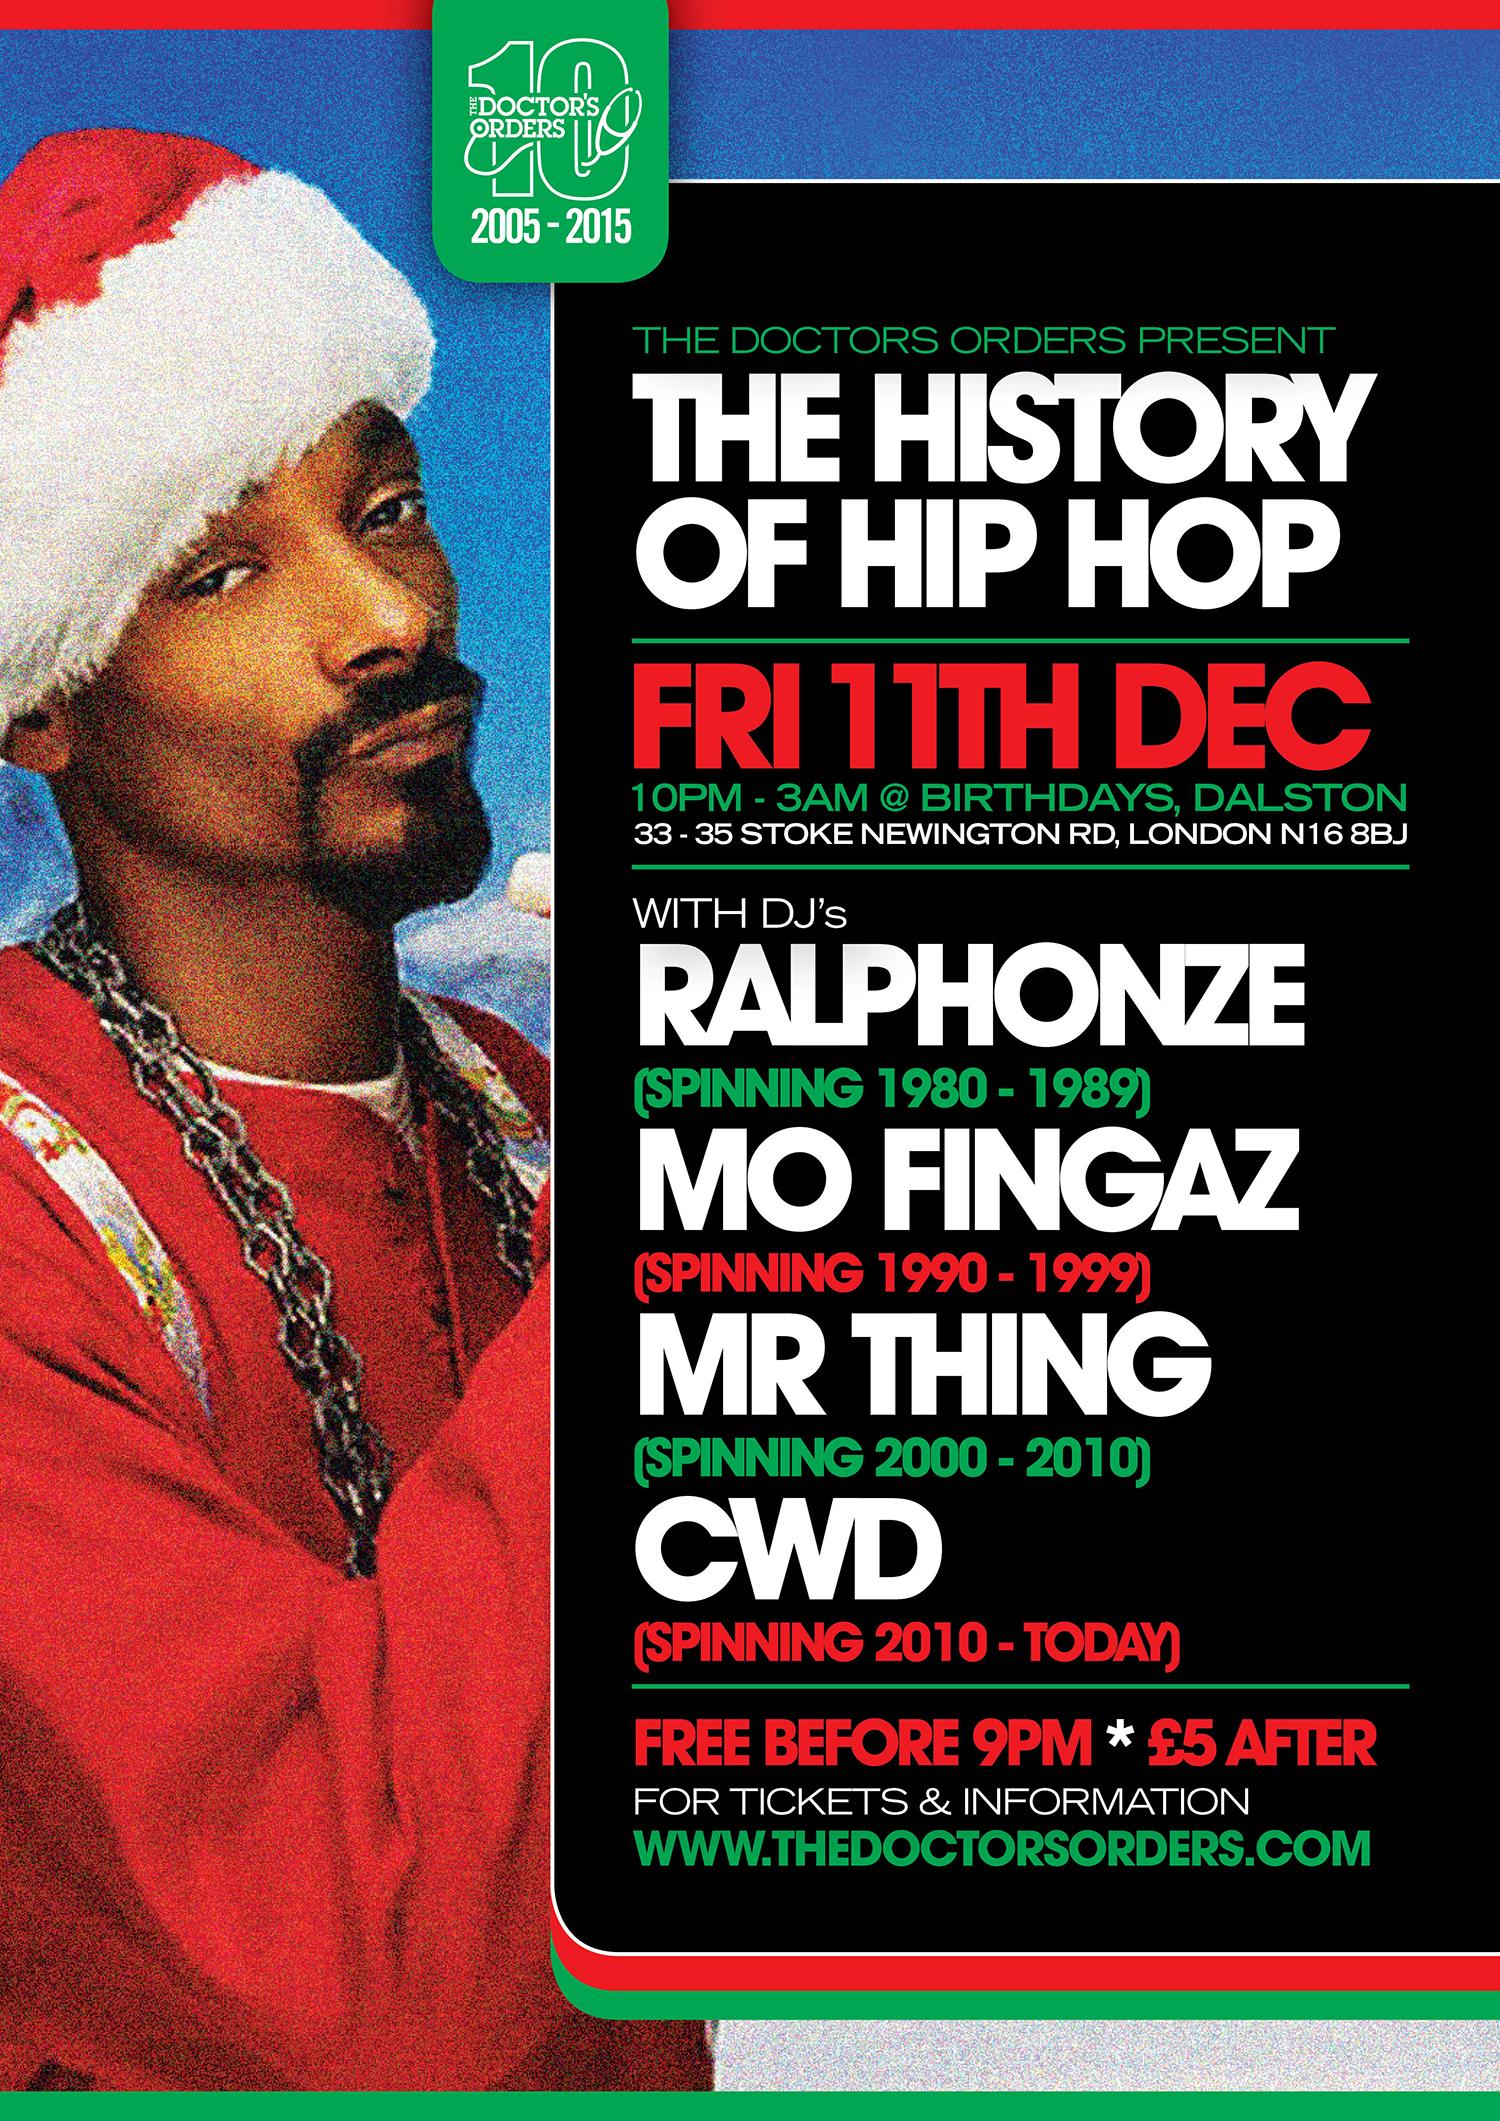 HistoryOfHipHop_Online_Dec15